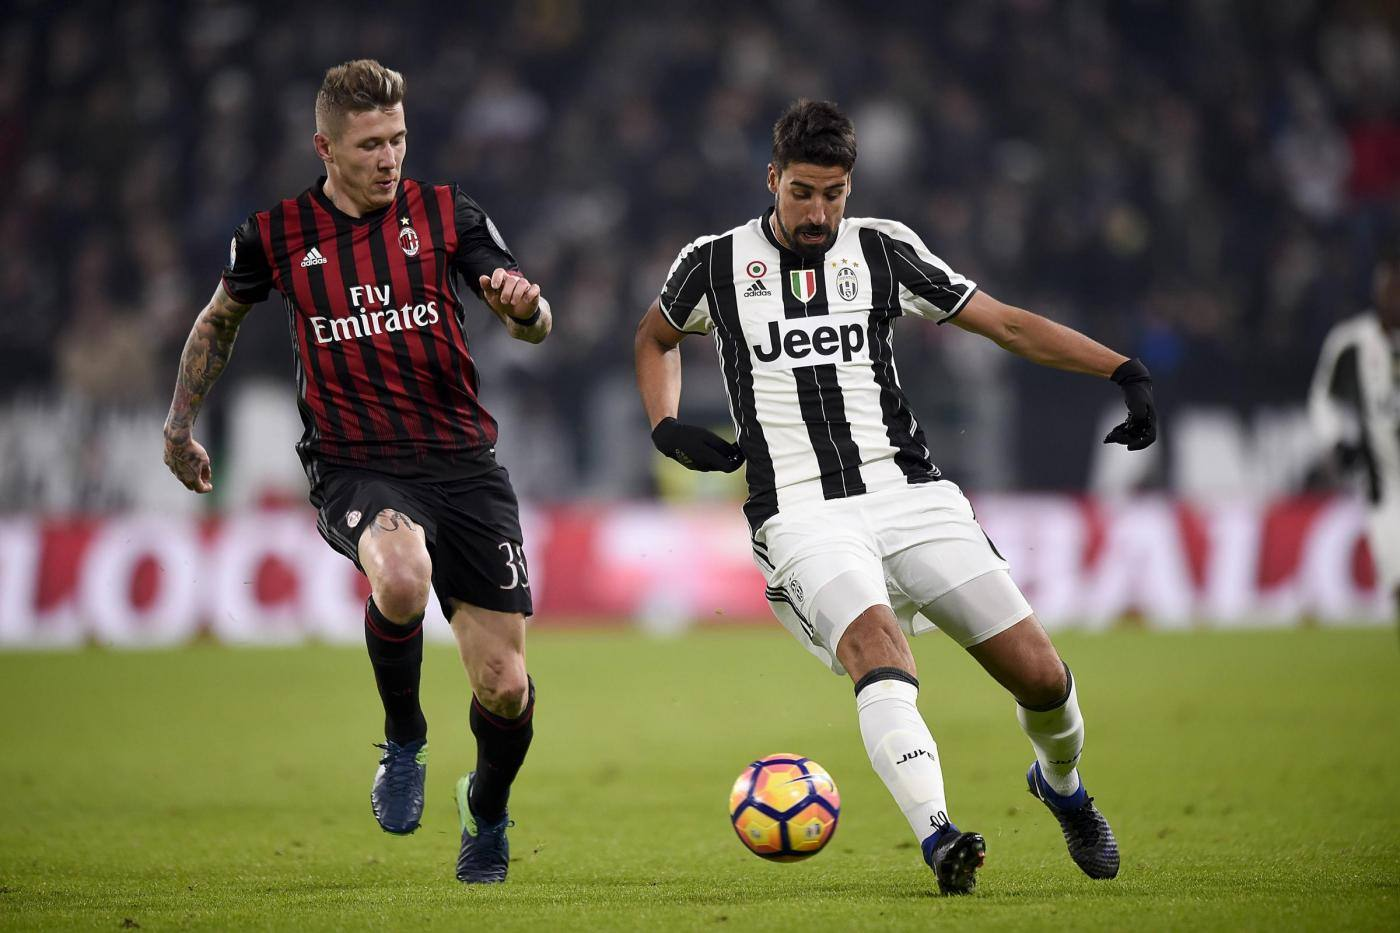 Juventus vs Milan Coppa Italia 2016/2017